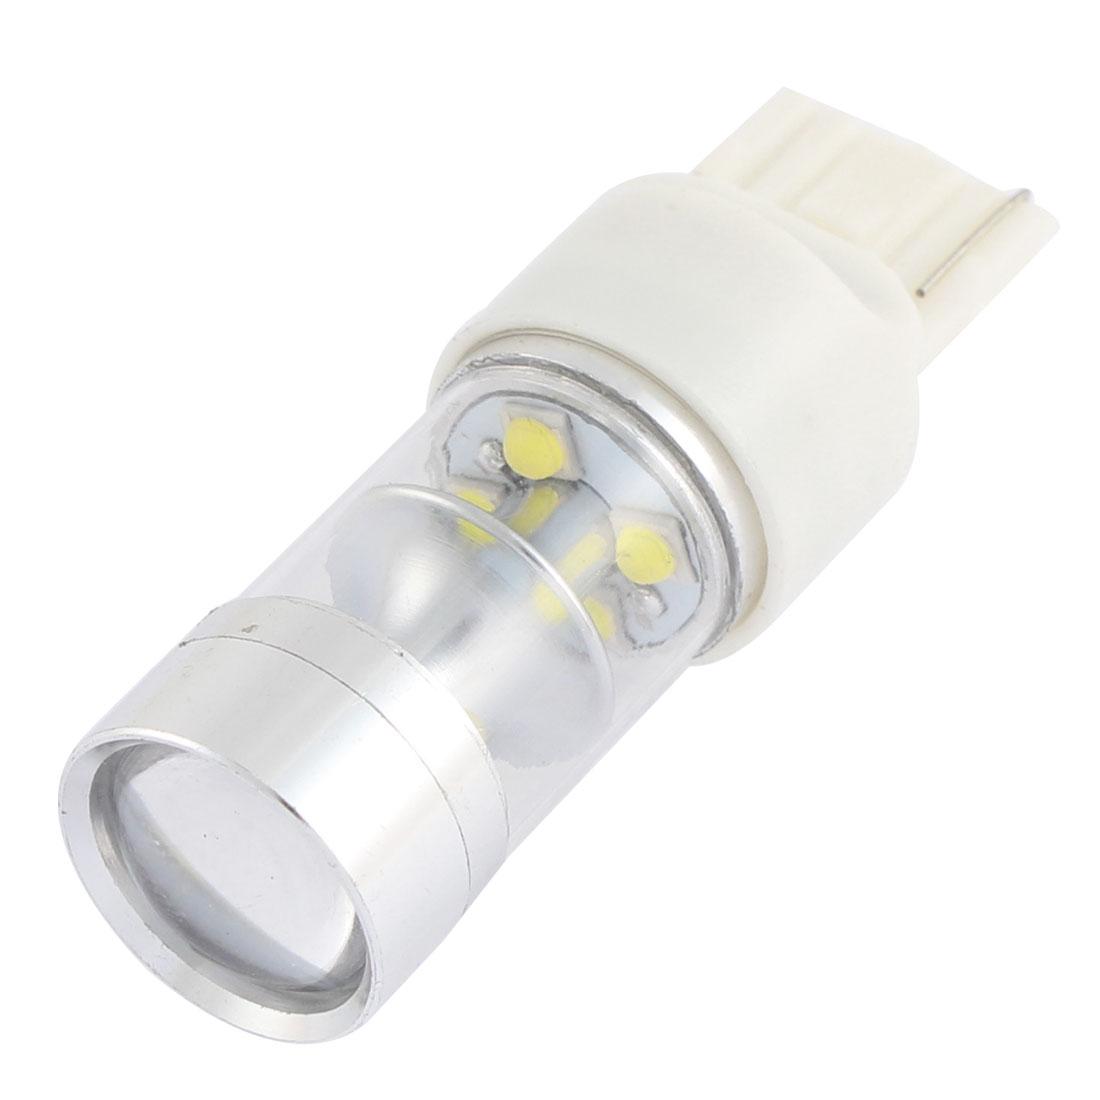 7440 7441 W21W White 10-LED Turn Signal Reverse Light Brake Tail Lamp Bulb 50W